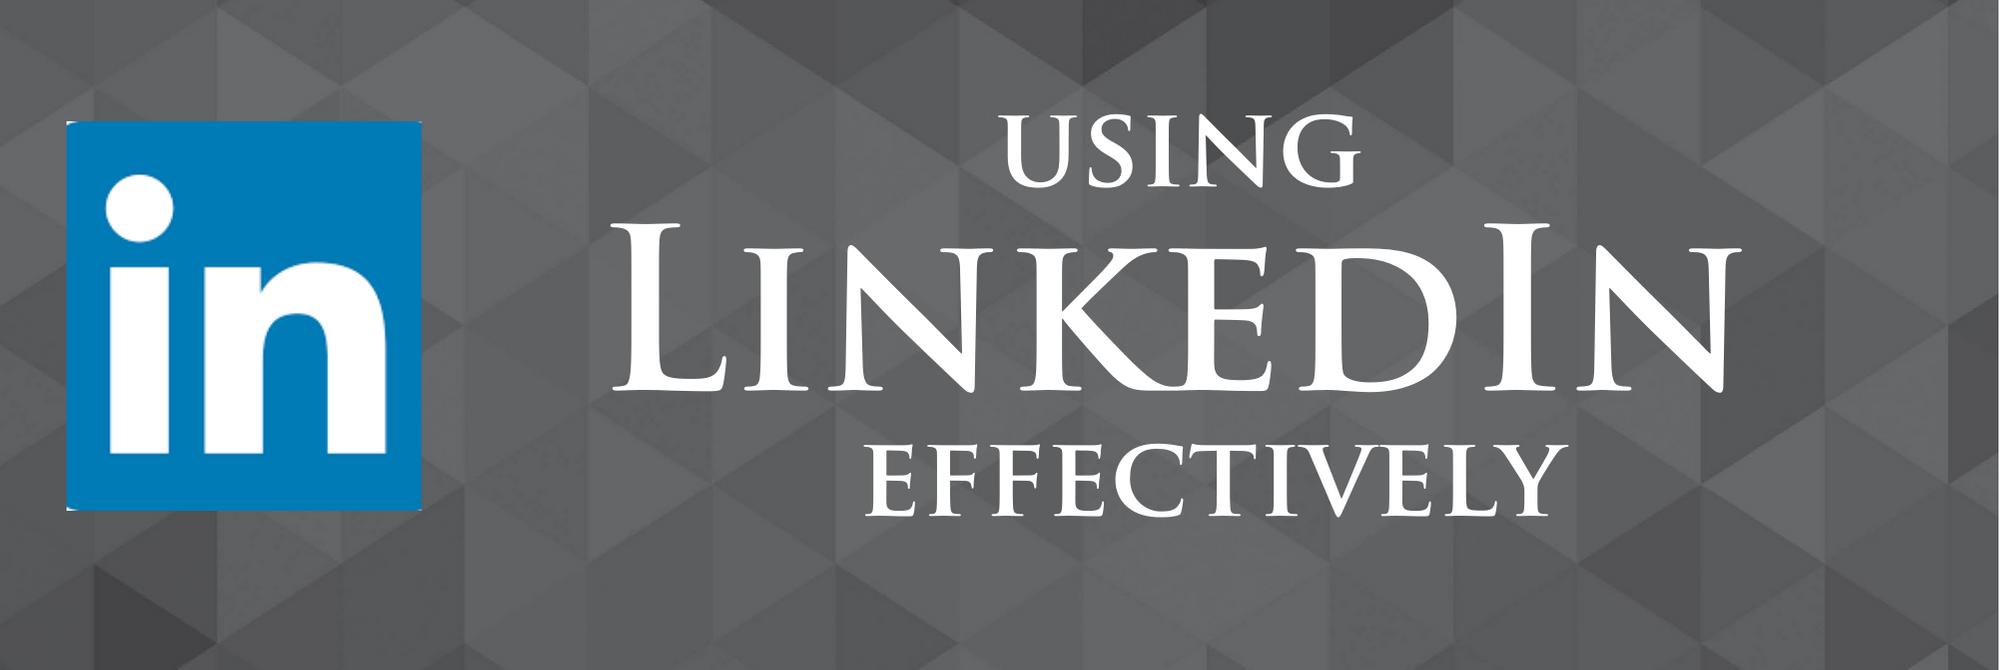 Creating LinkedIn content